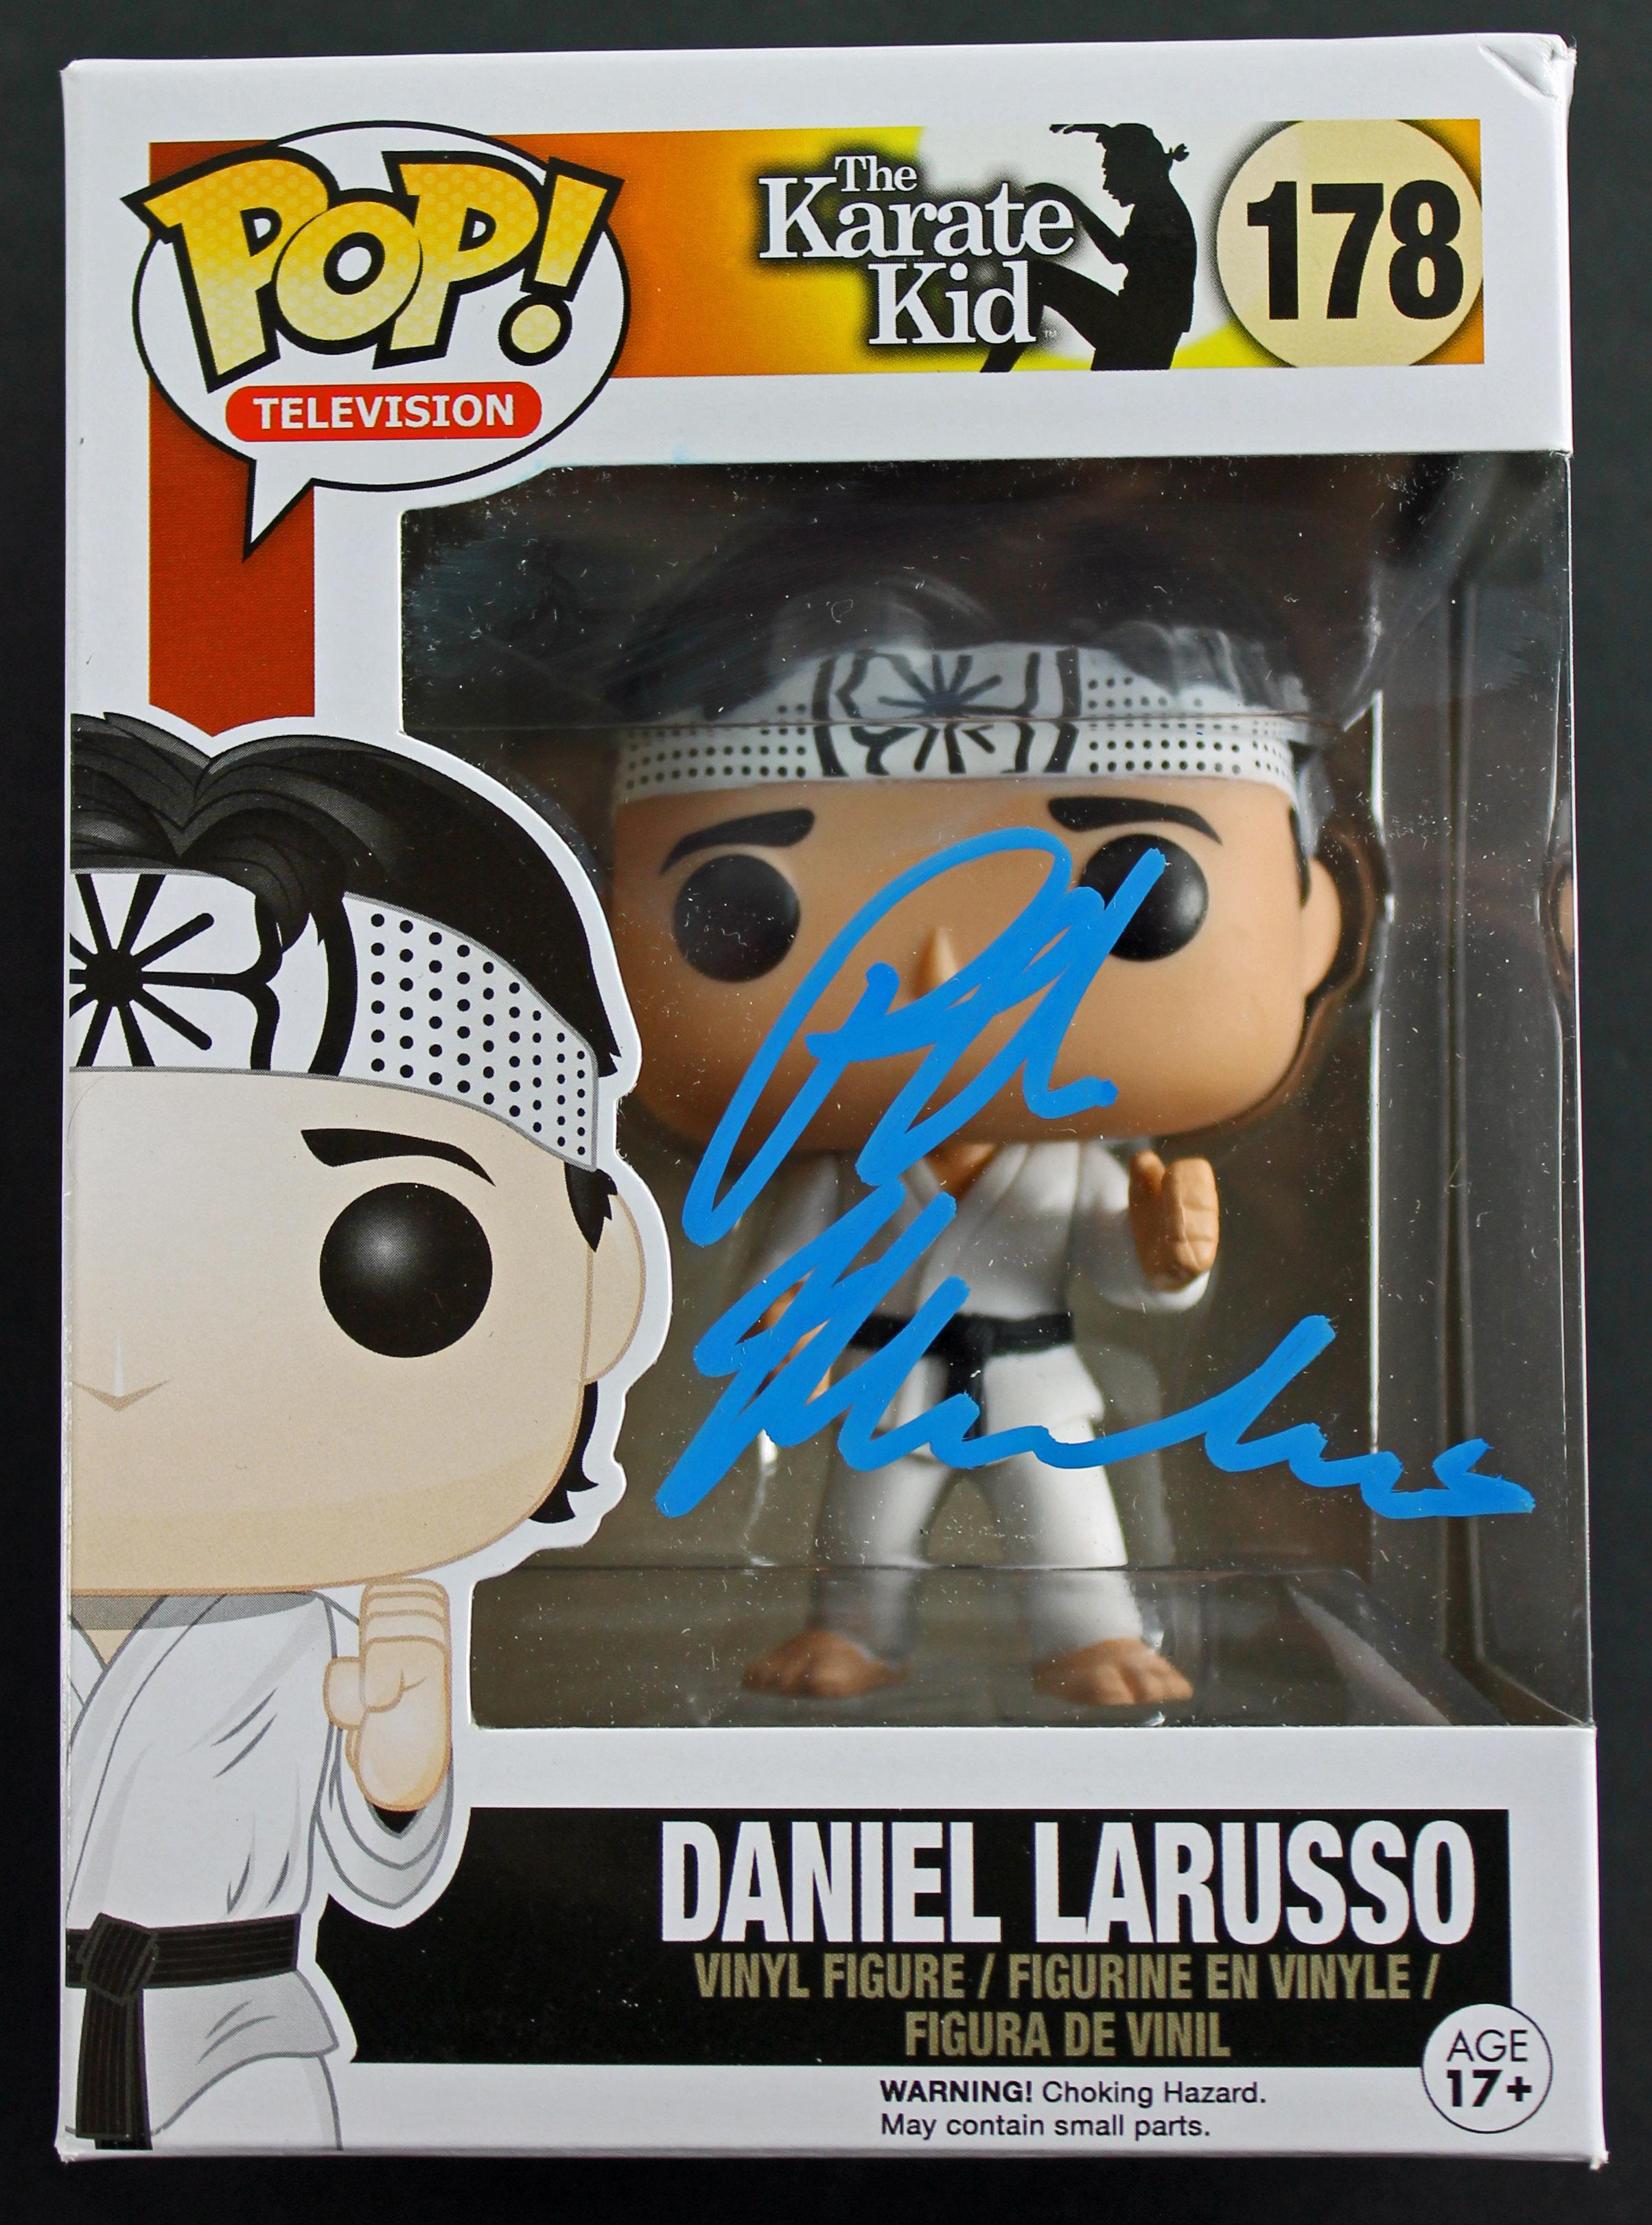 Ralph Macchio Authentic Signed The Karate Kid Funko Pop Vinyl Figure PSA/DNA